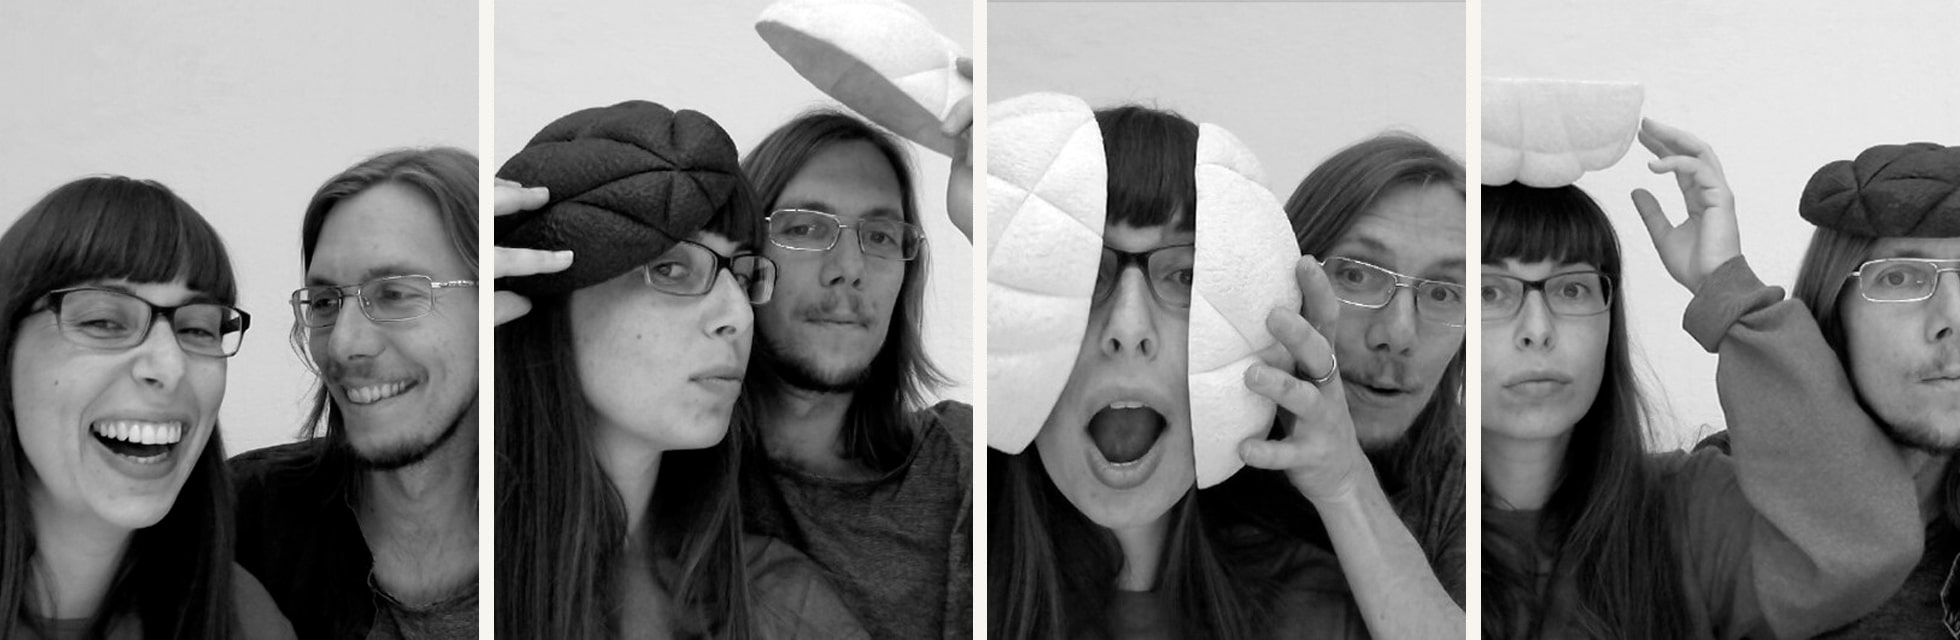 Farg et Blanche photomaton